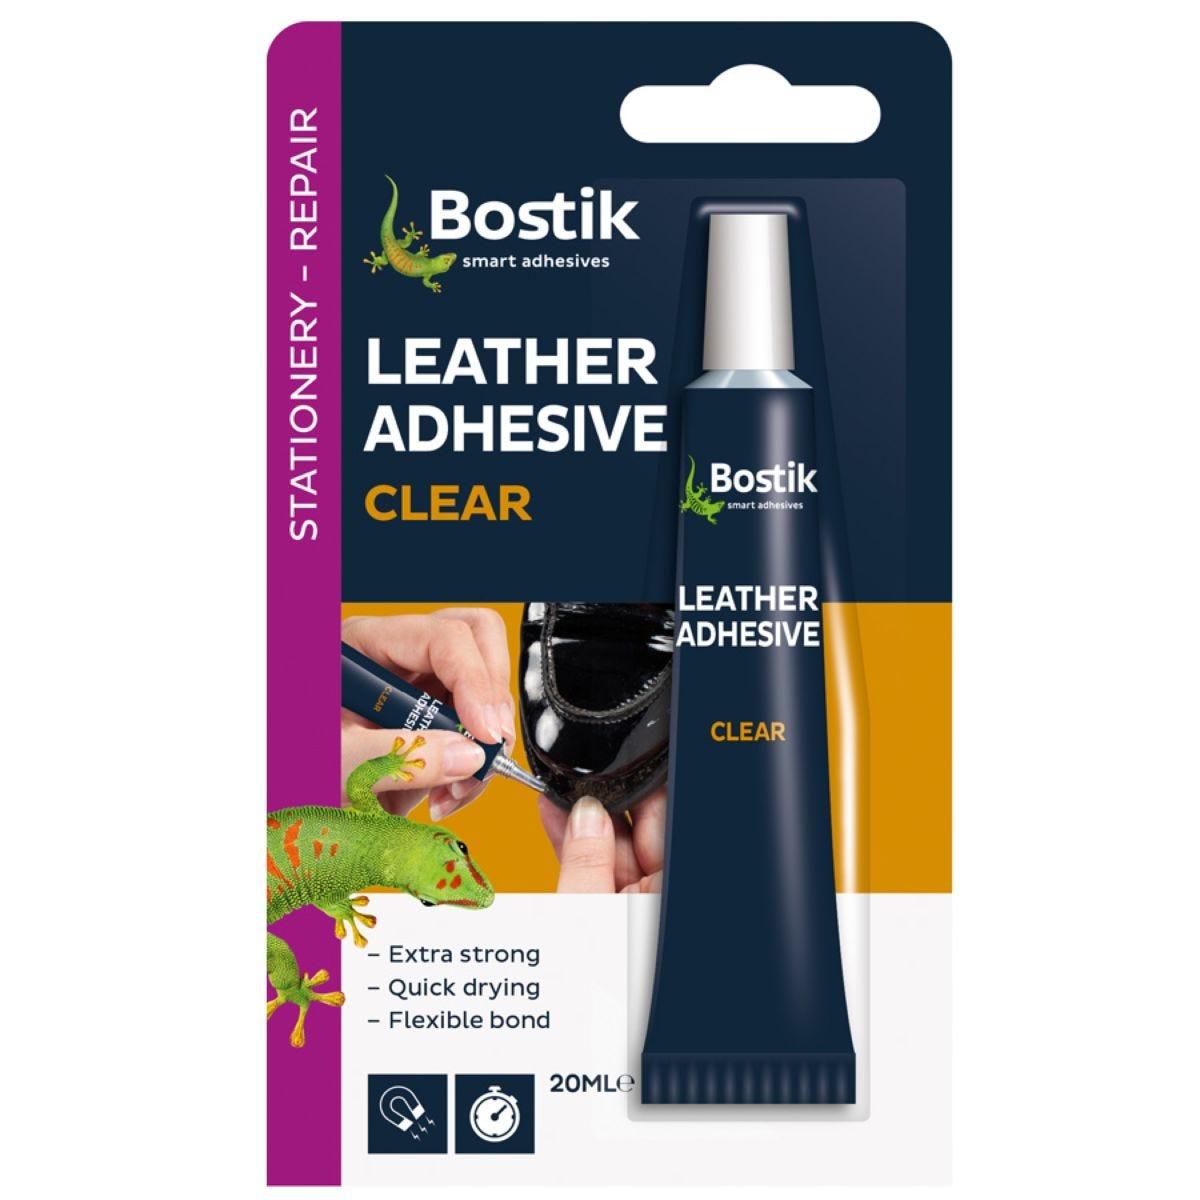 Bostik Leather Adhesive Glue Tube 381513 20ml